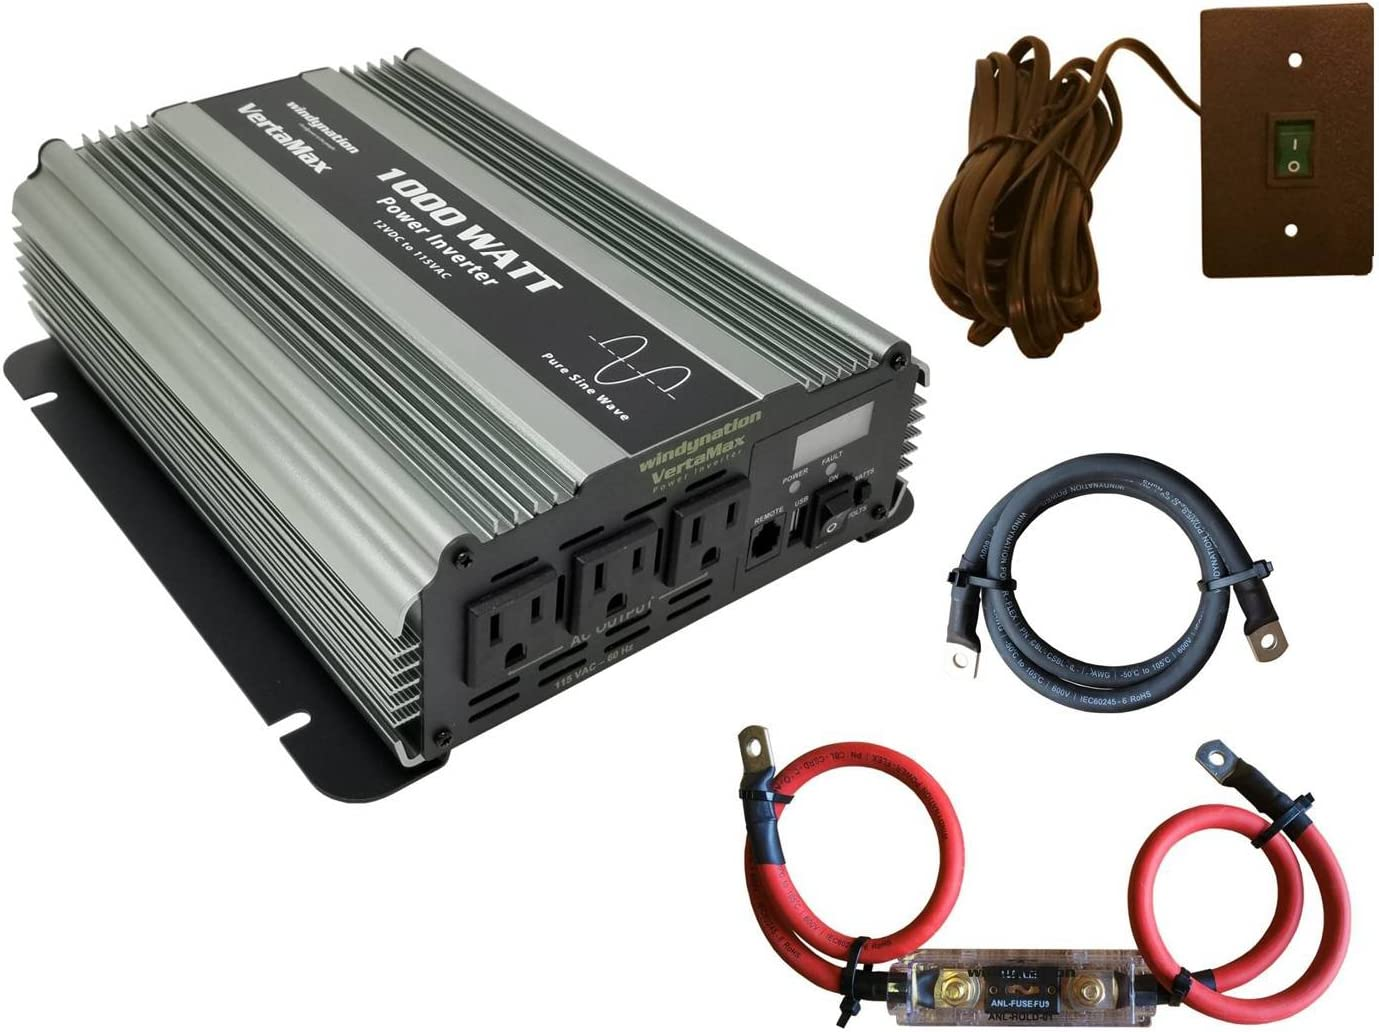 VertaMax Pure SINE Wave 1000 Watt 2000W Surge 12V 12 Volt Power Inverter DC to AC Power Cables Remote Control Switch ANL Fuse USB Port – Solar, RV, Car, Boat